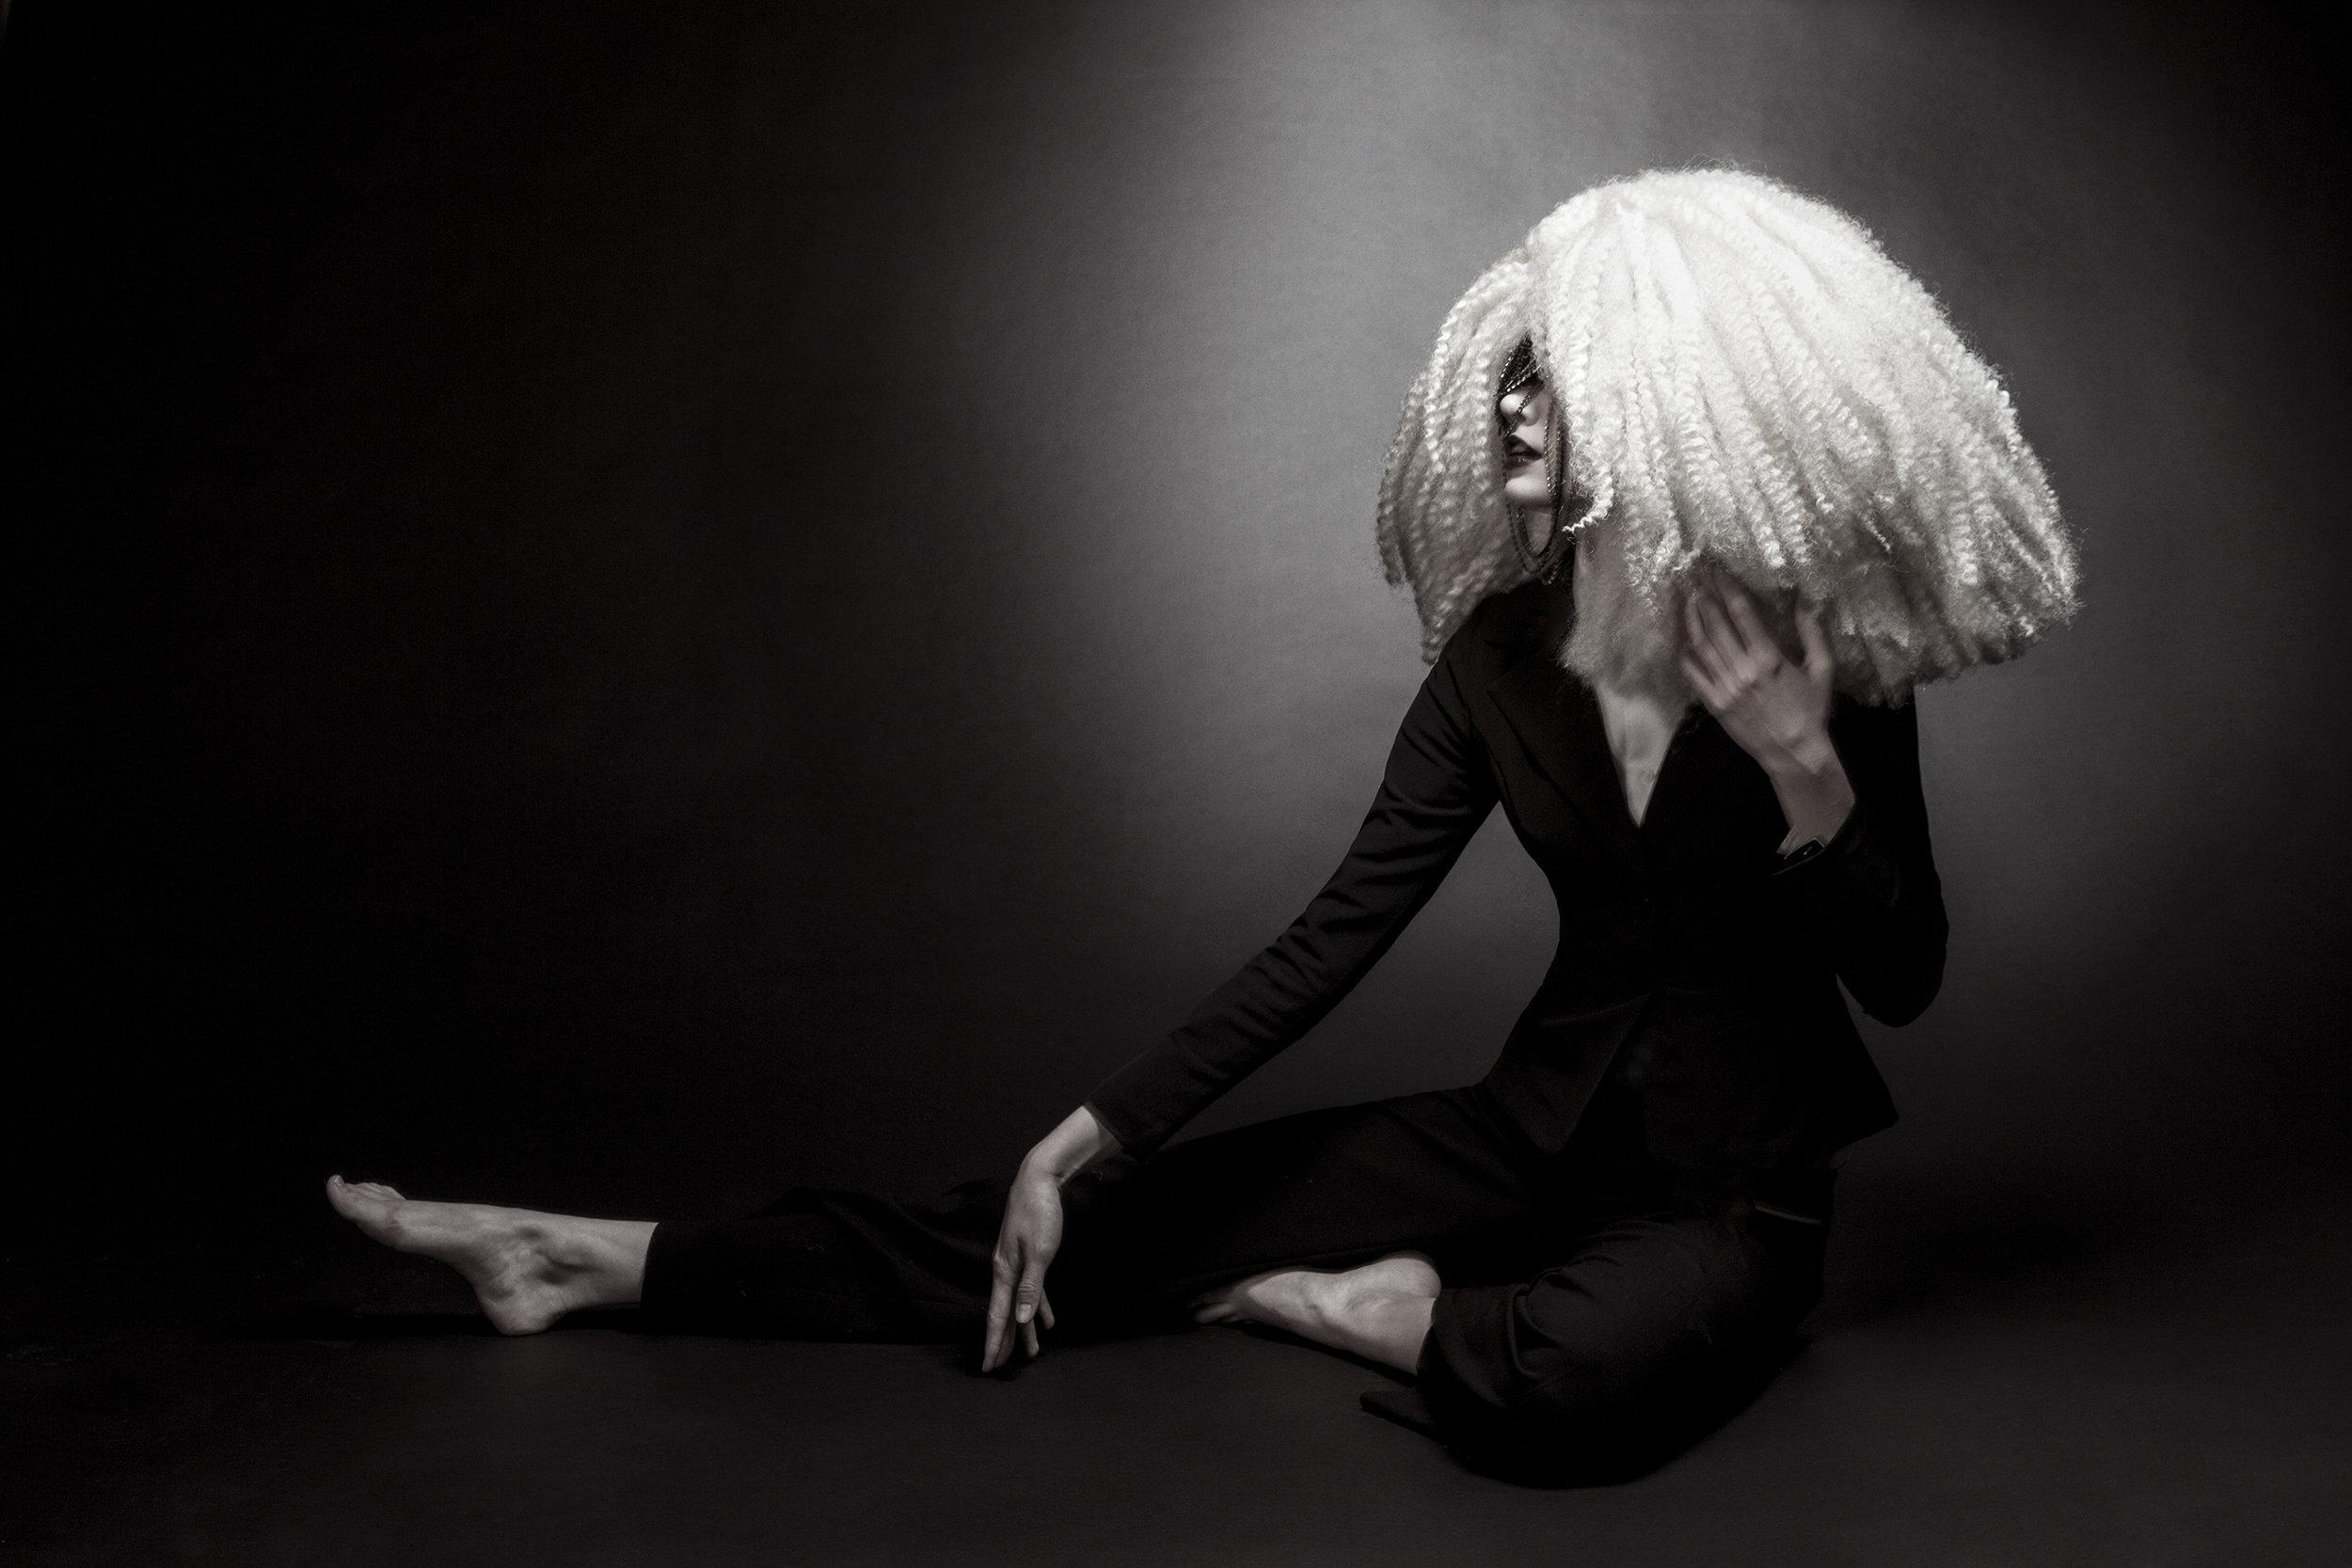 fashion-edgy-editorial-dark-gothic-bighair-platinum-blonde-moody-leather-sleek-black-beuty-hombre-makeup-redlip02.jpg